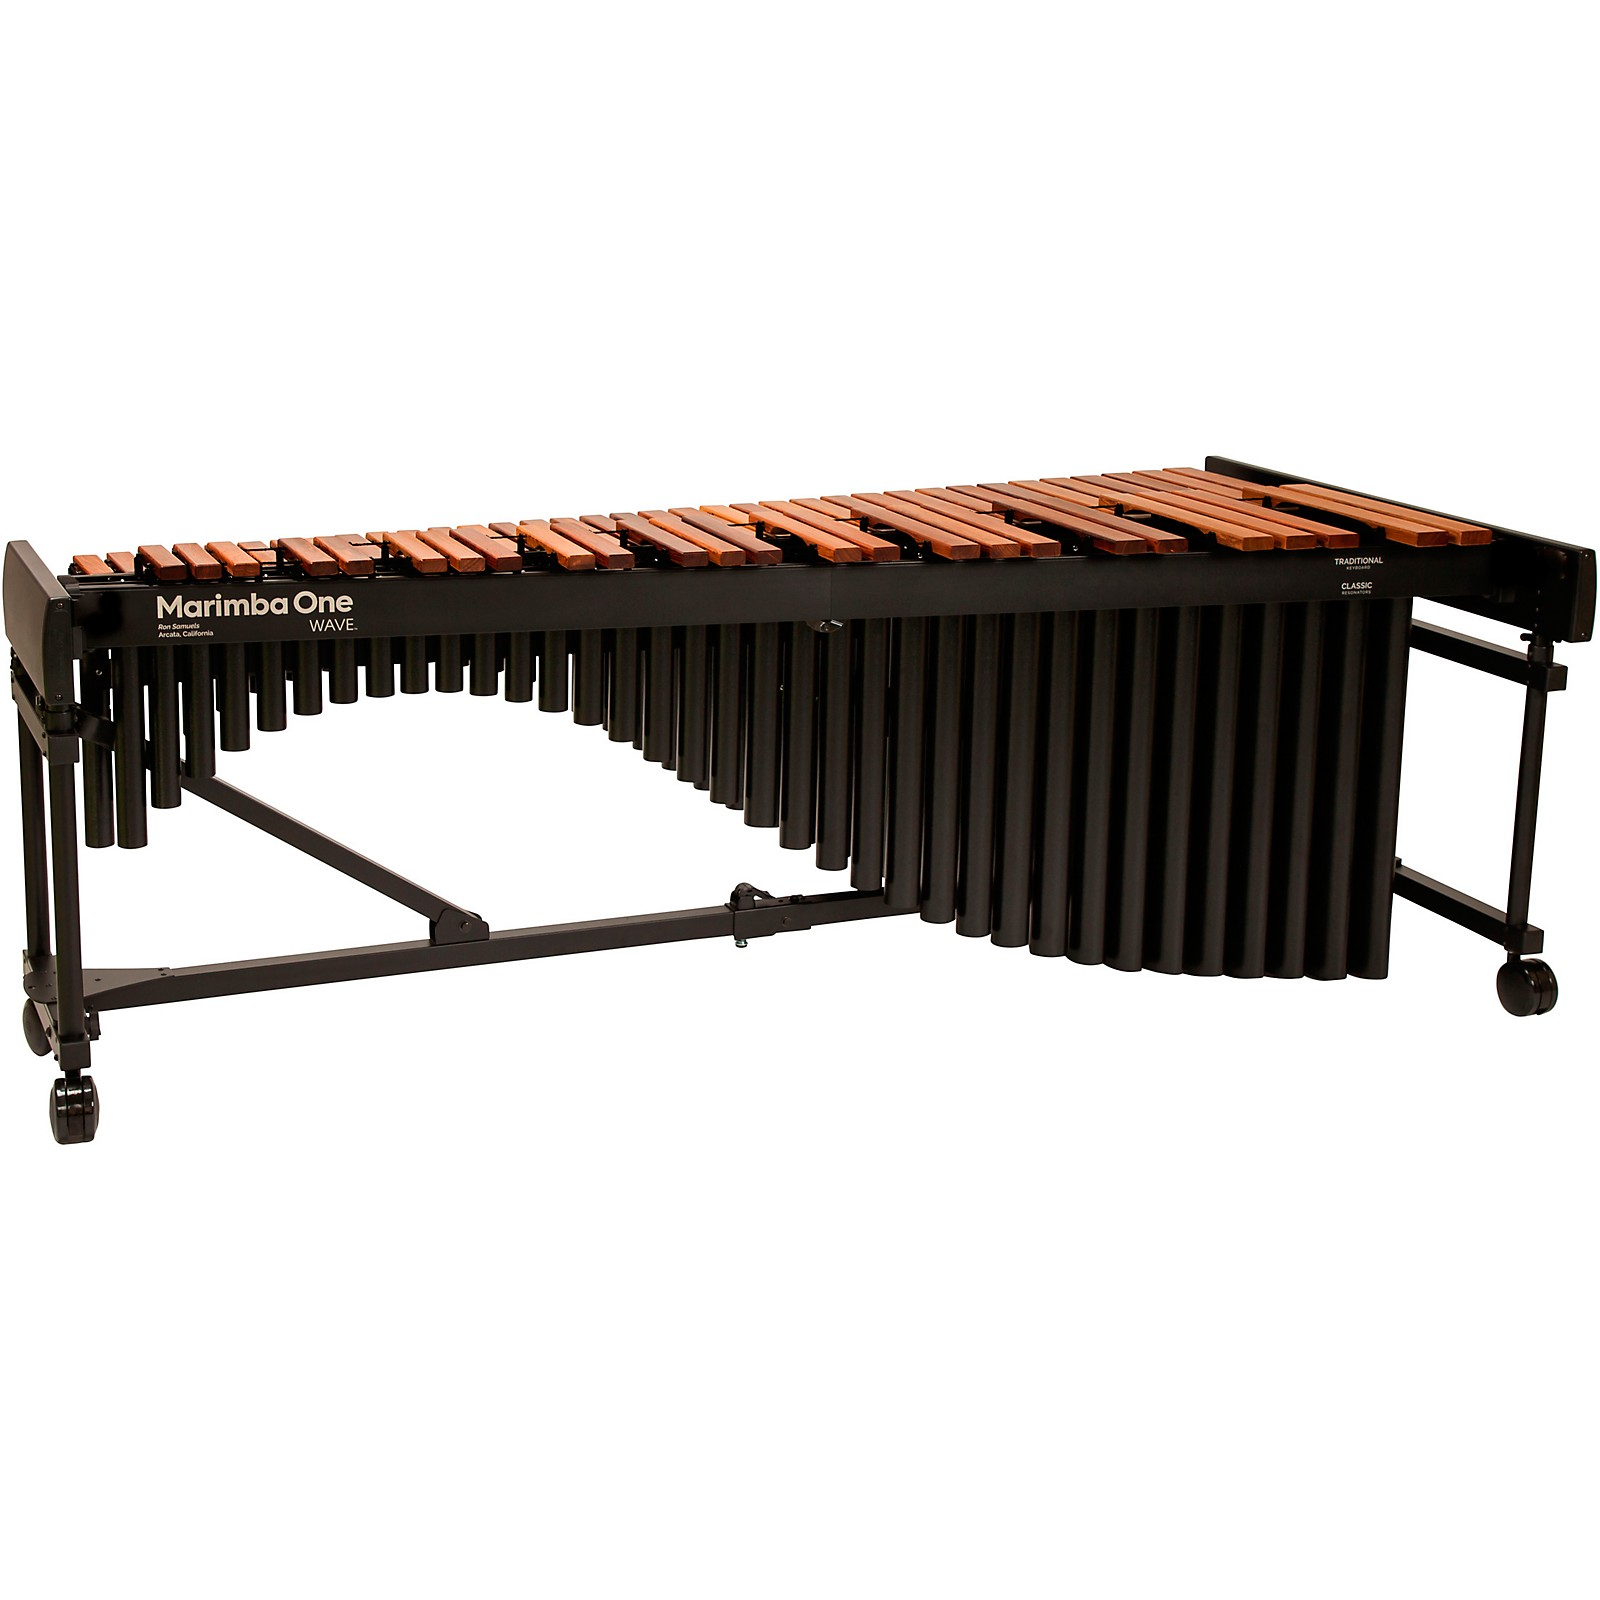 Marimba One Wave #9603 A442 5.0 Octave Marimba with Premium Keyboard and Classic Resonators 4